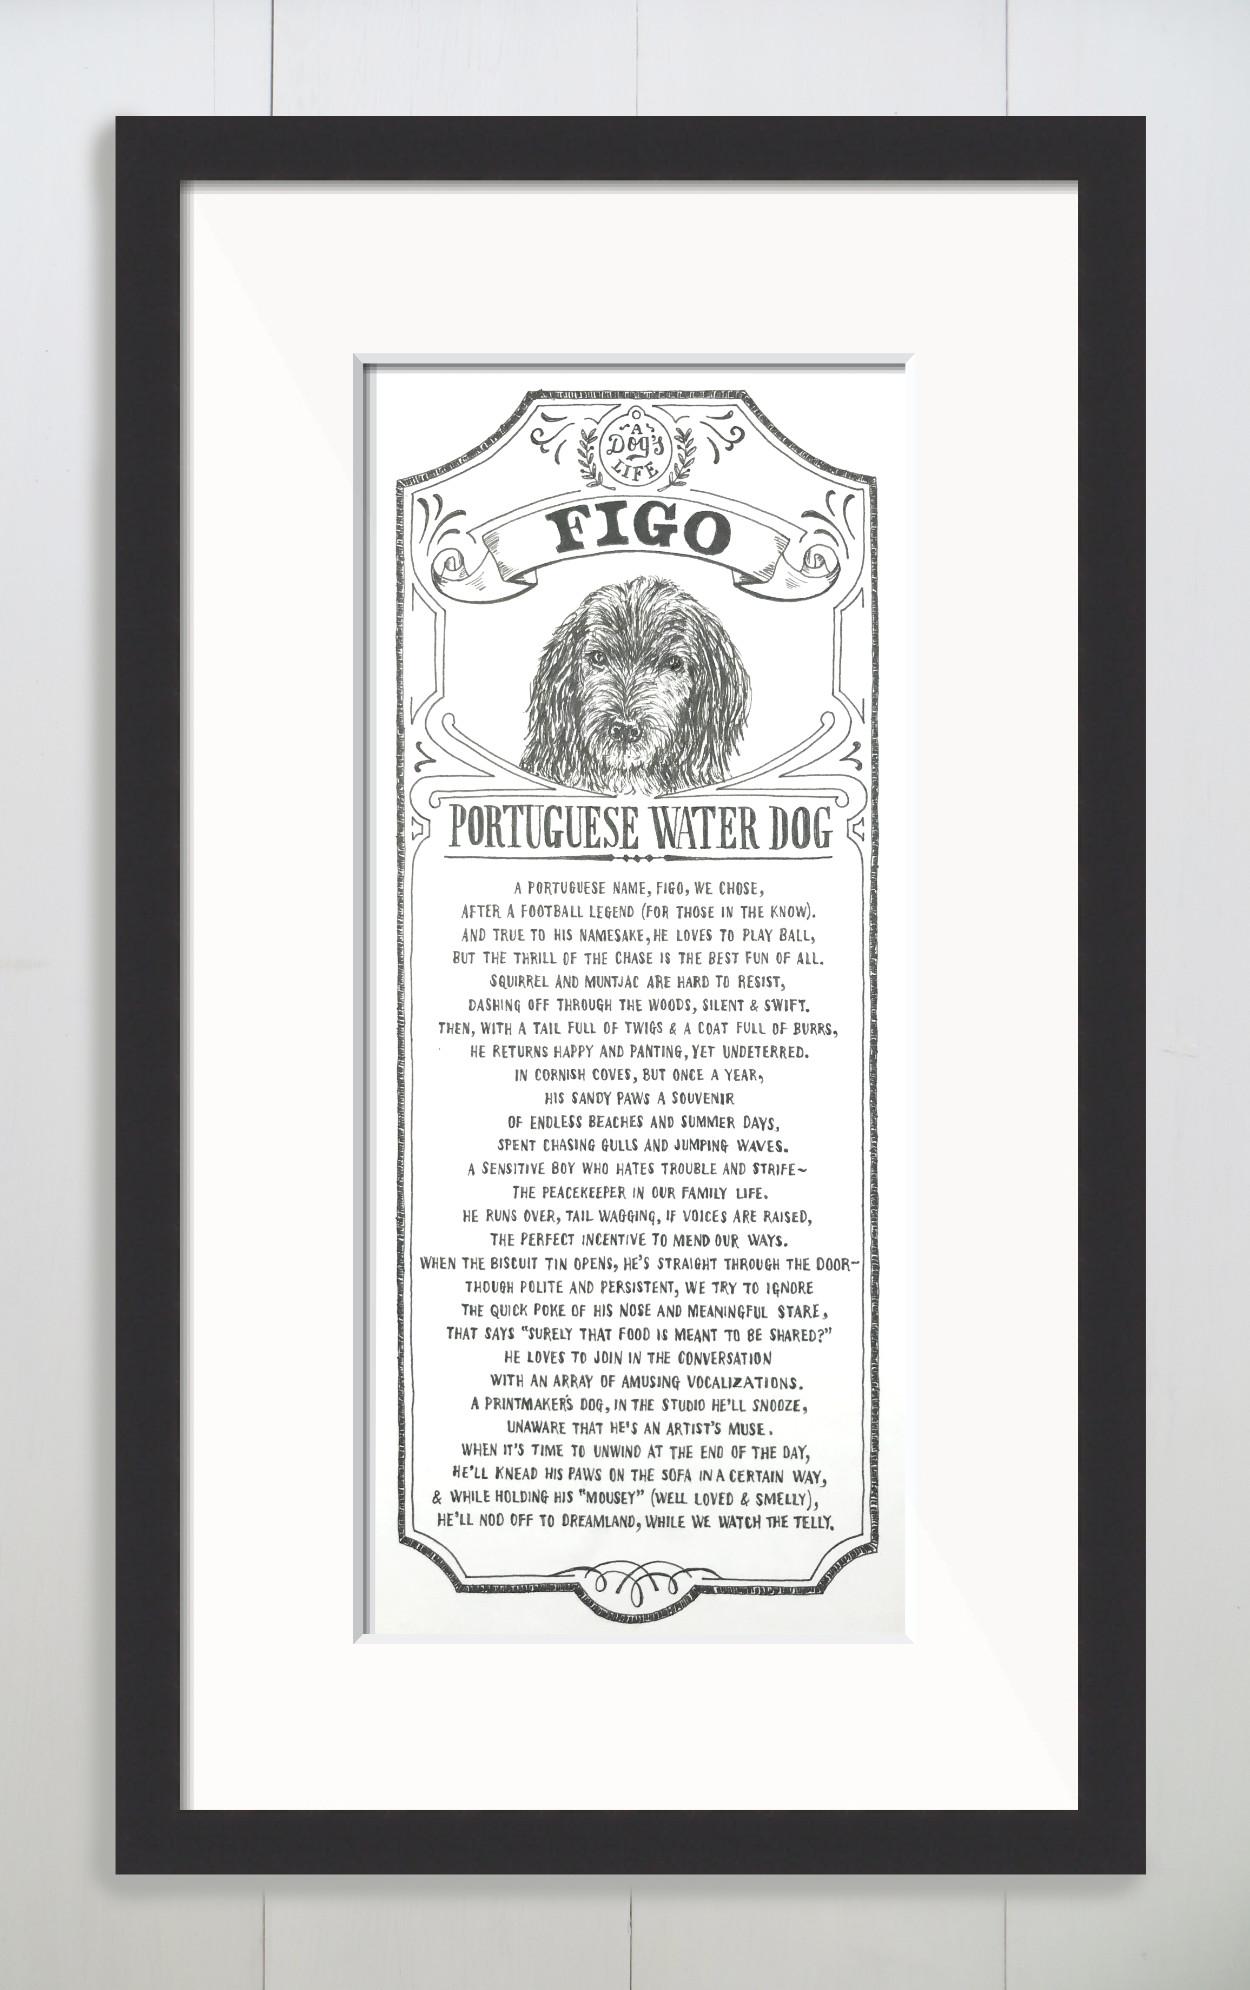 Bespoke Dog Portrait Illustrated Poem | The Enlightened Hound